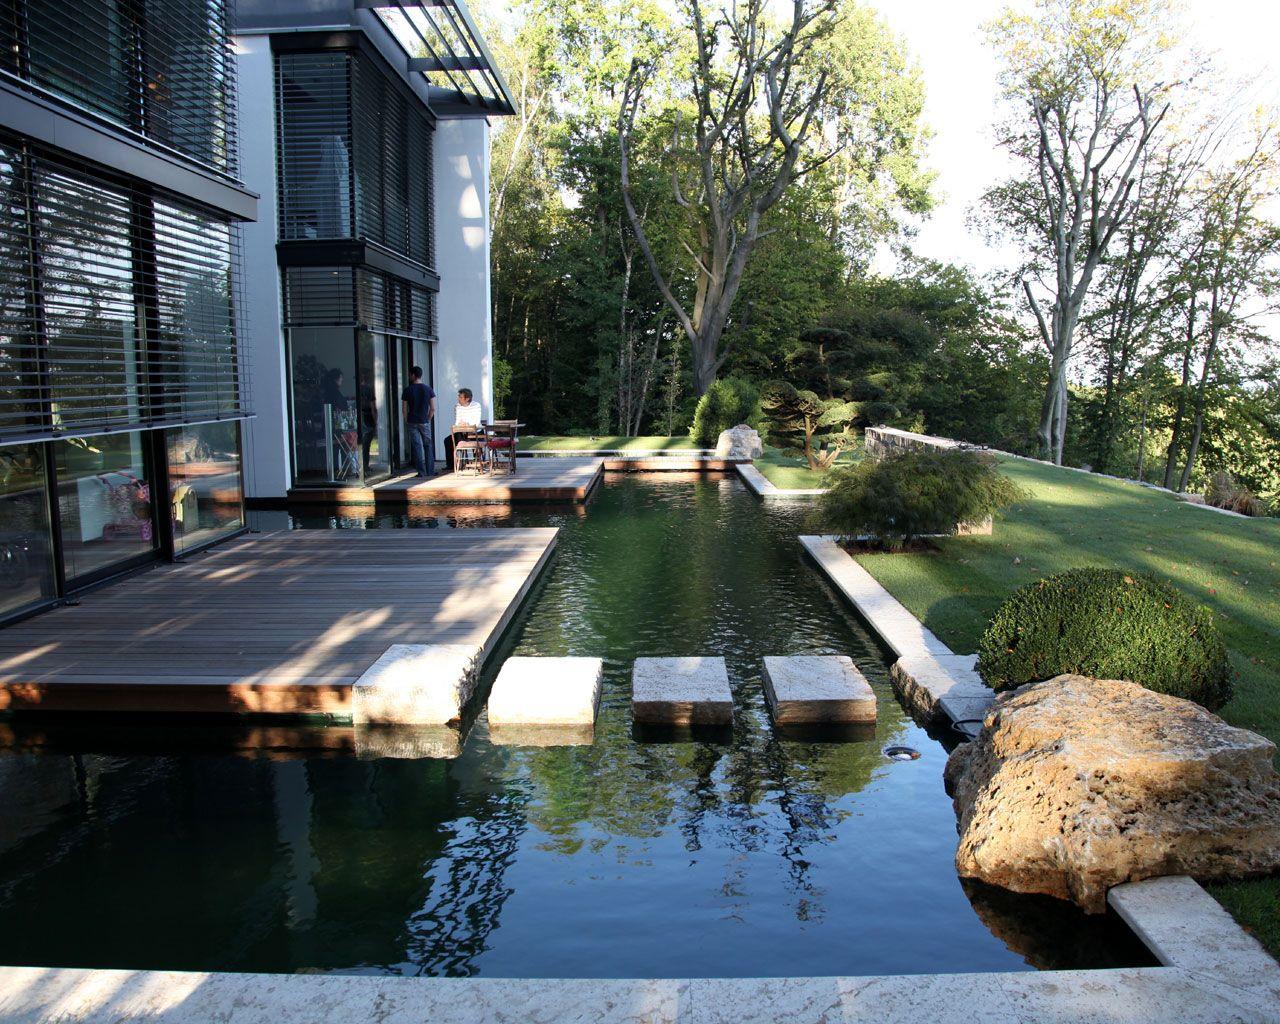 Formale Gärten Wasser Garten Kirchner Garten Pinterest